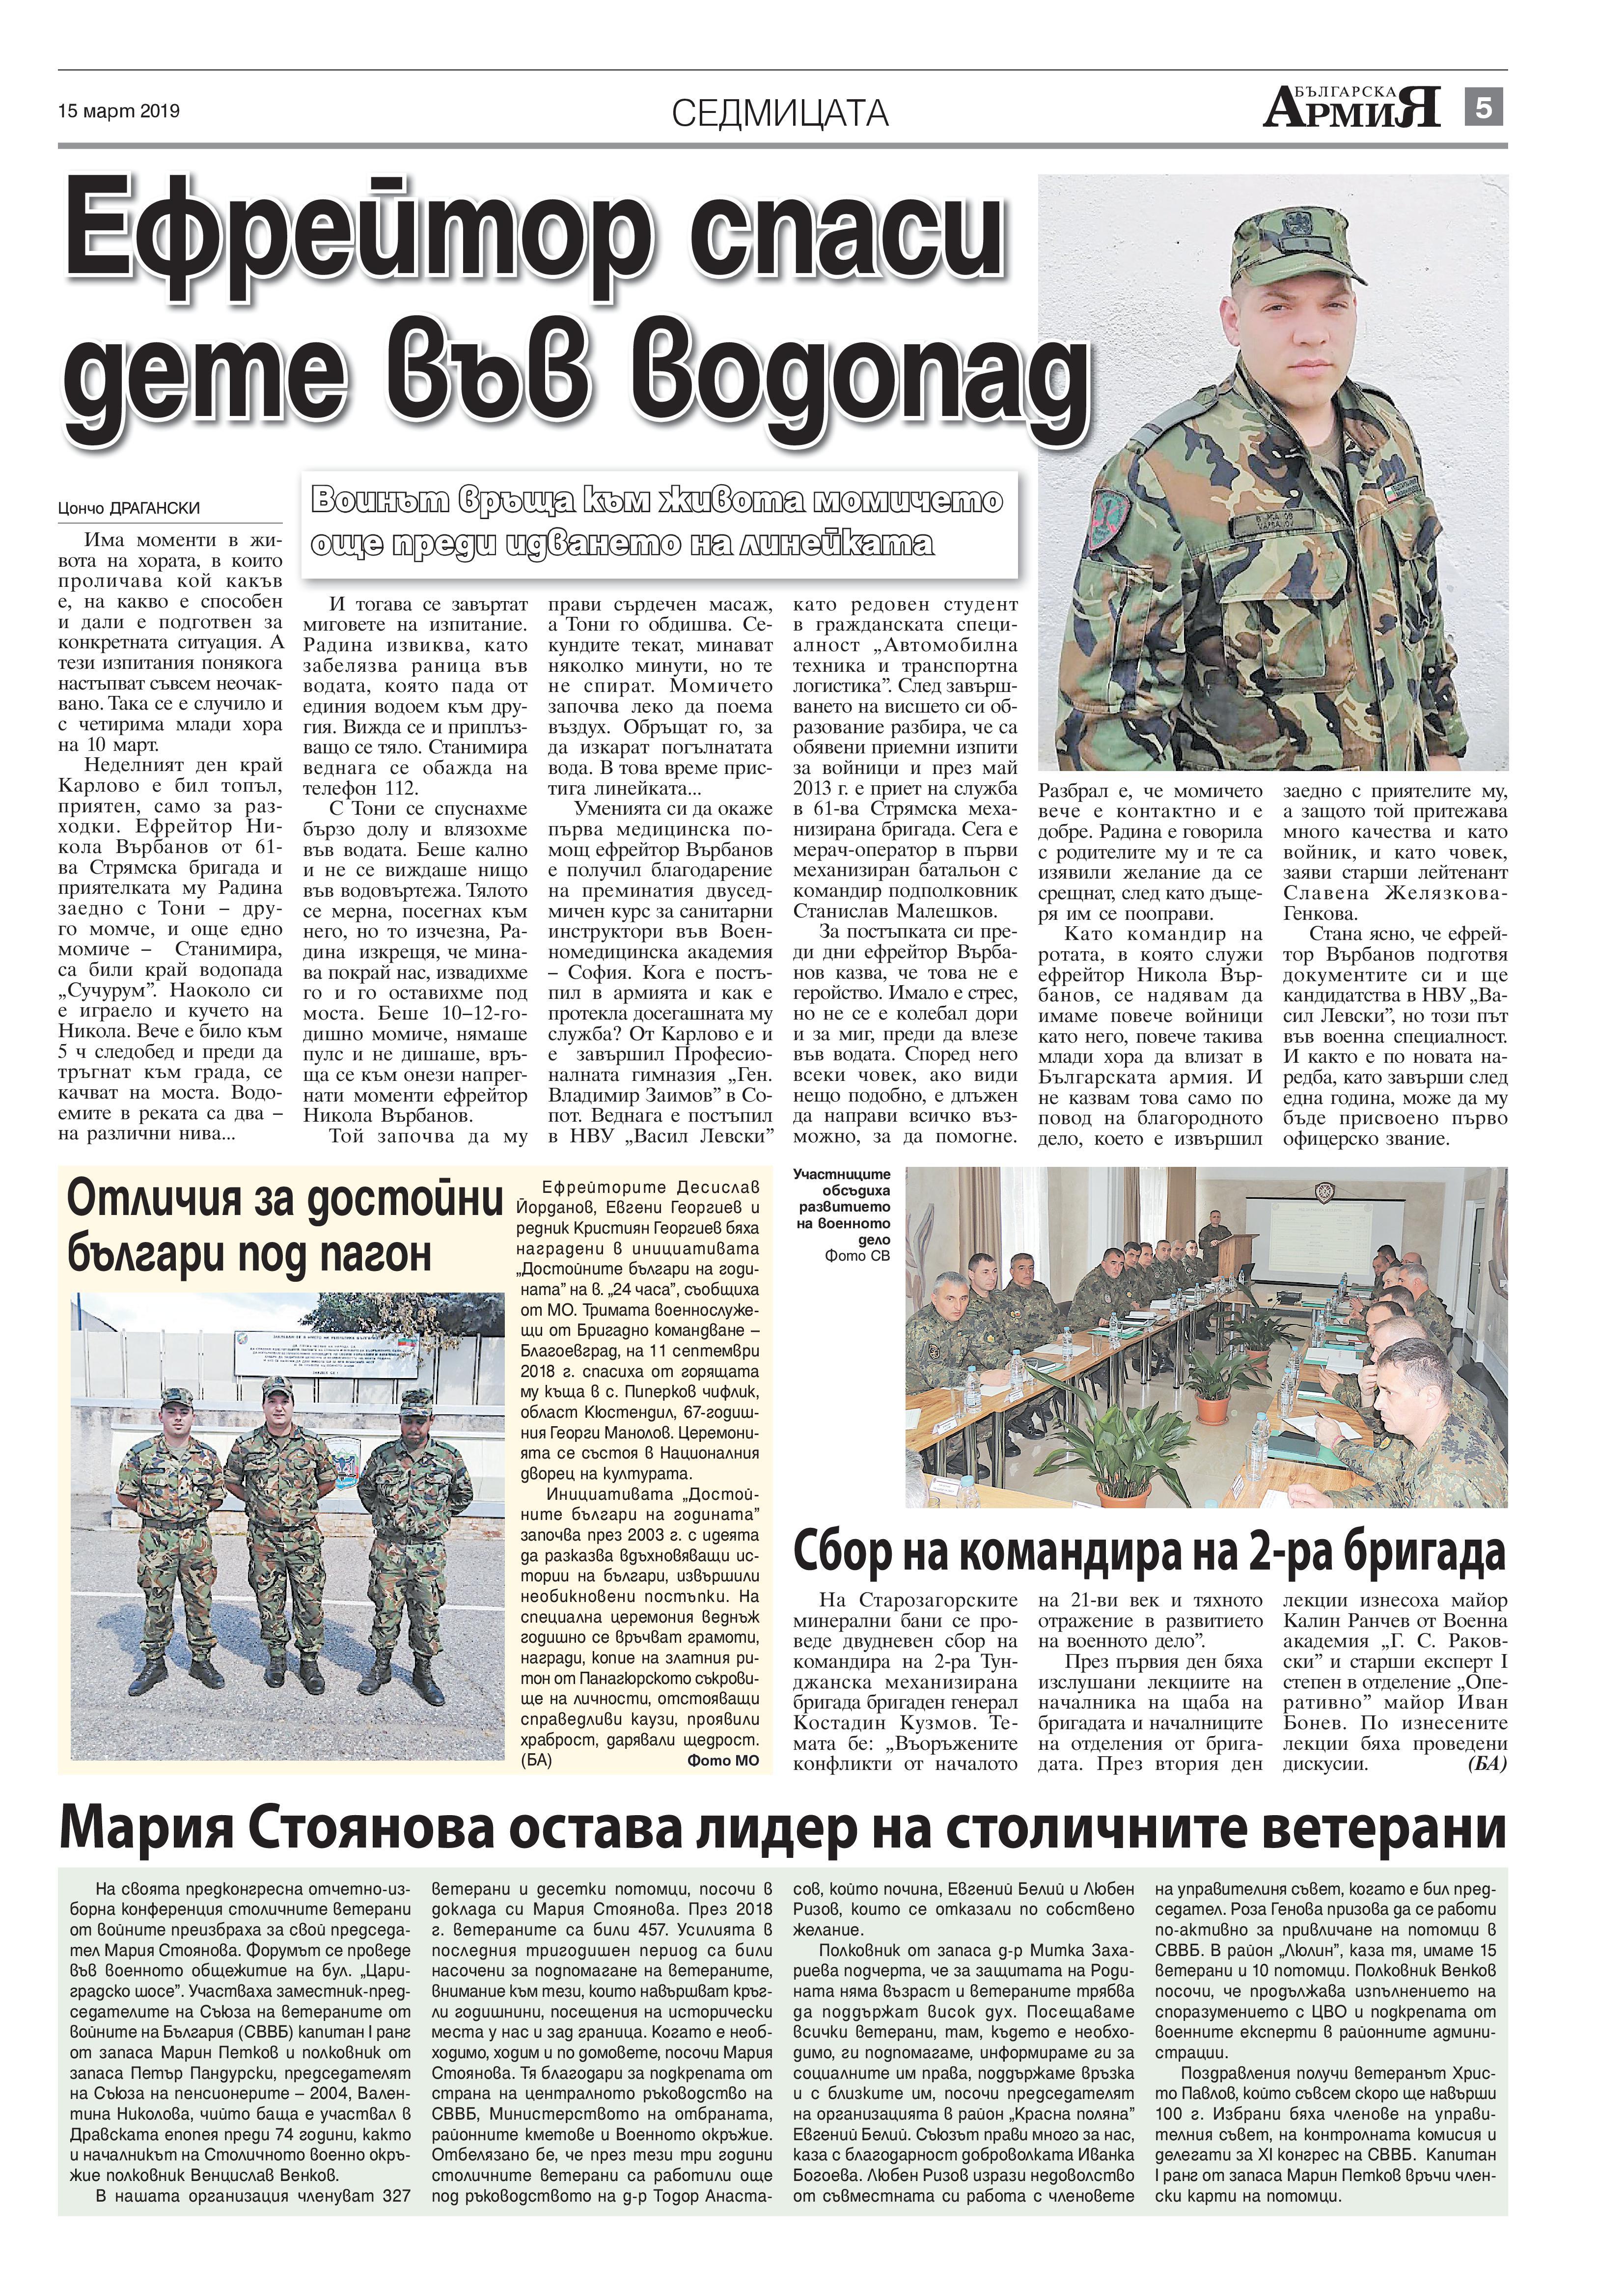 https://armymedia.bg/wp-content/uploads/2015/06/05-26.jpg